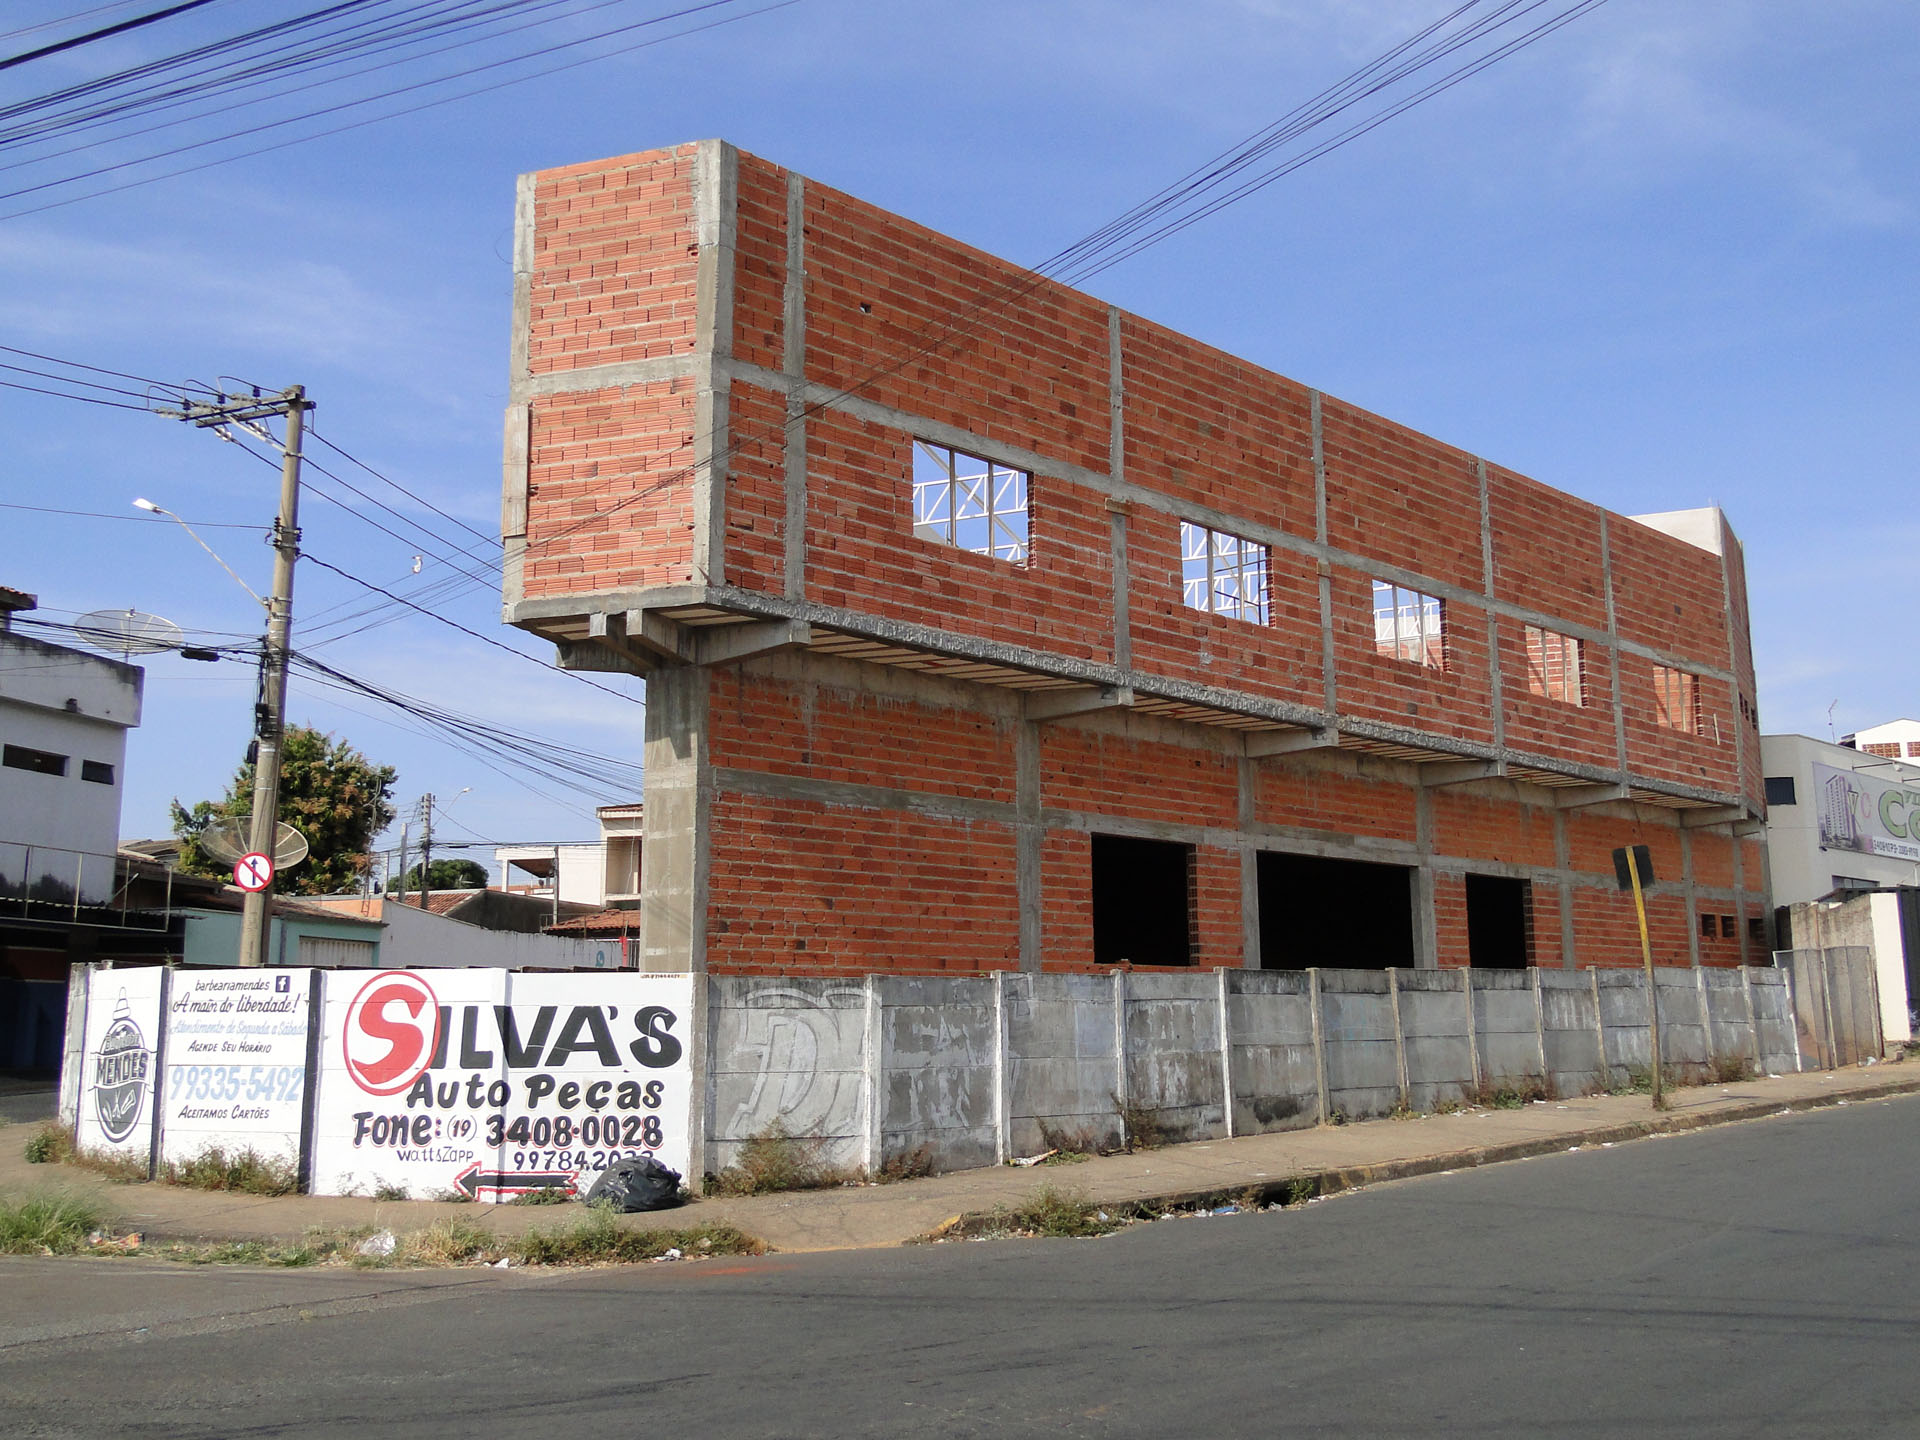 Bandini São jeronimo